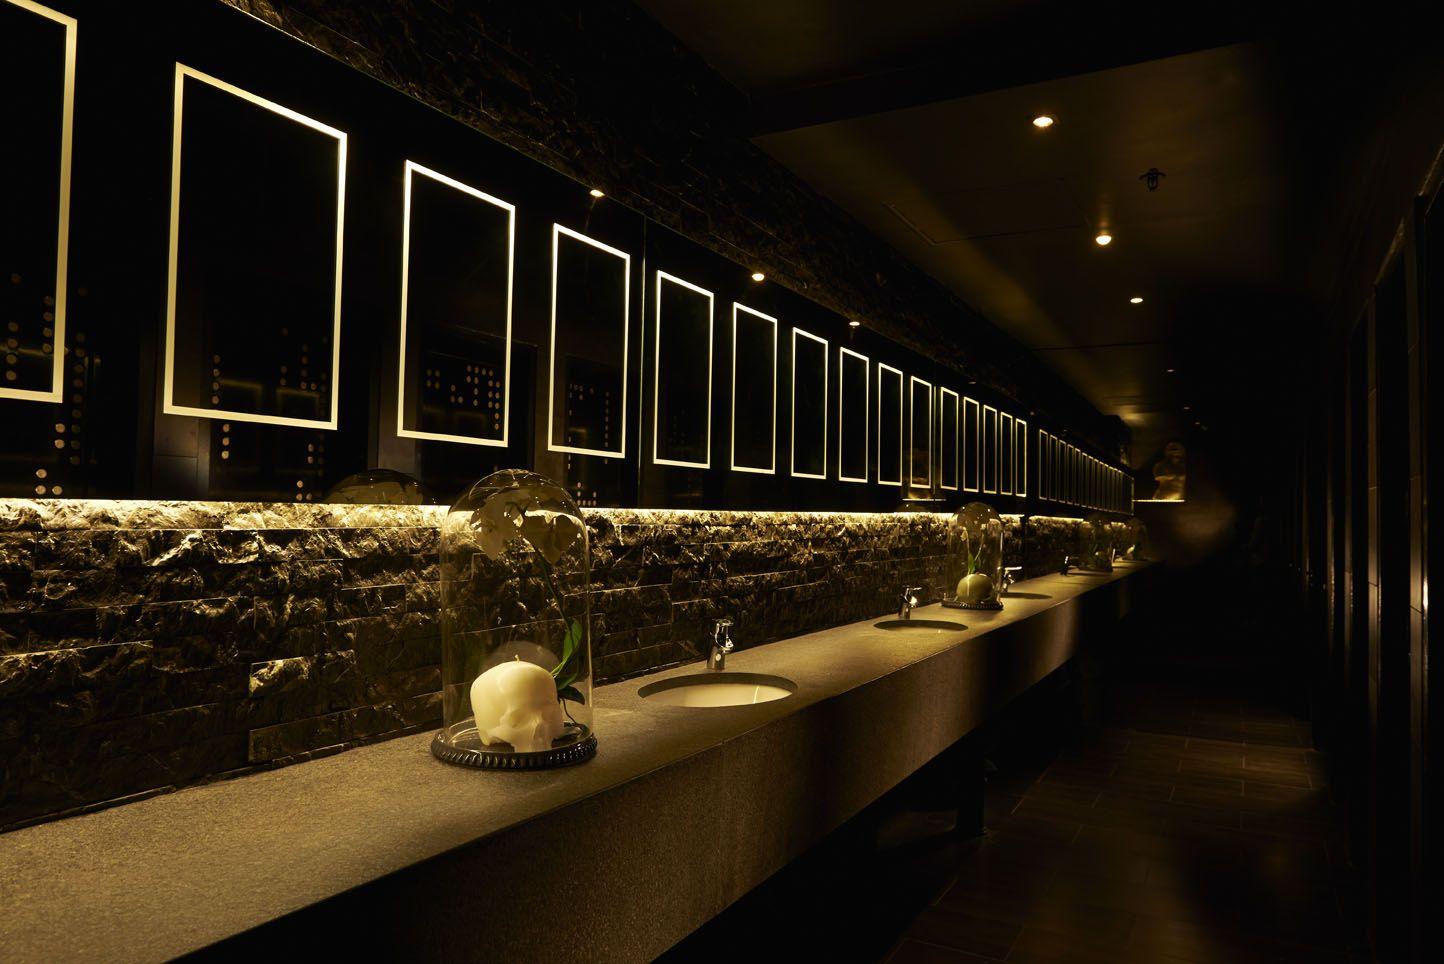 Bathroom Lights Cape Town kong nightclub-bathroom counter #interiordesign #bathroom